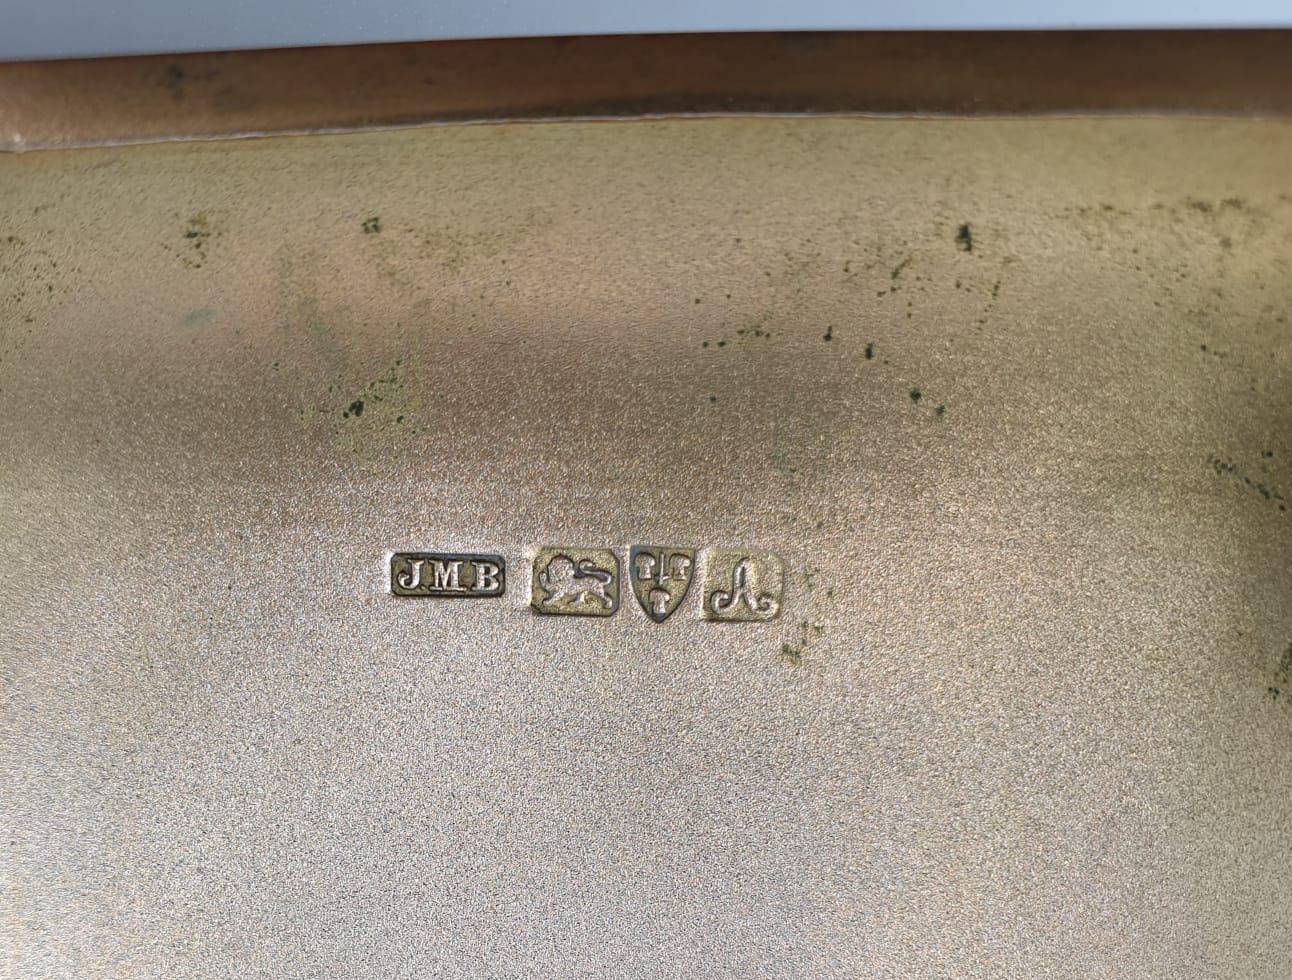 Edwardian John Millward Banks, Sterling Silver Cigarette Case Box with engraving on front, - Image 7 of 8